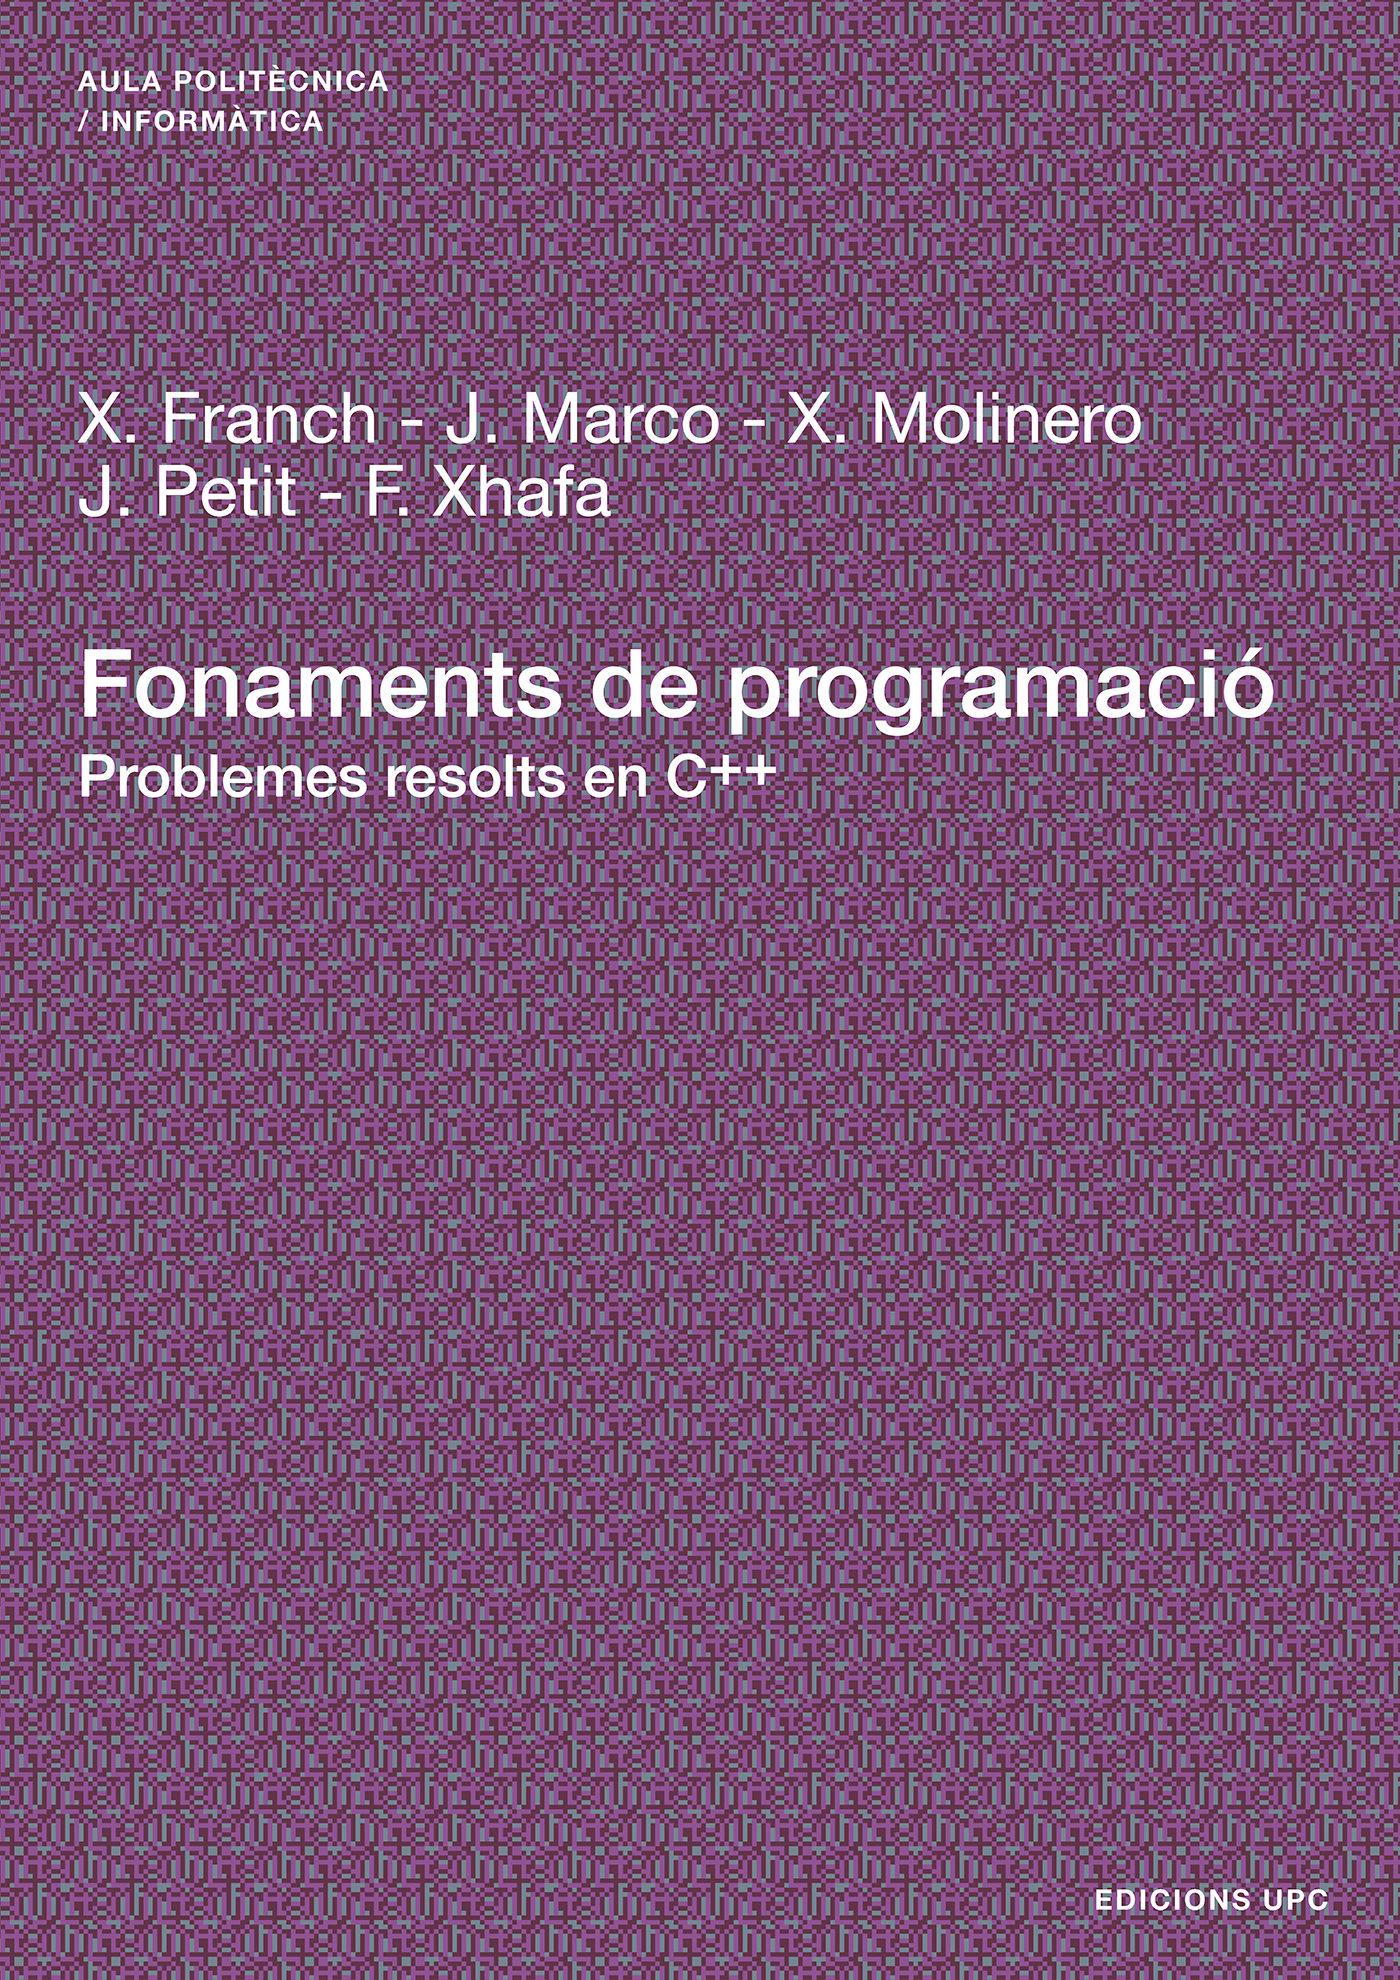 Fonaments De Programacio: Problemes Resolts En C++ por Xavier Franch epub